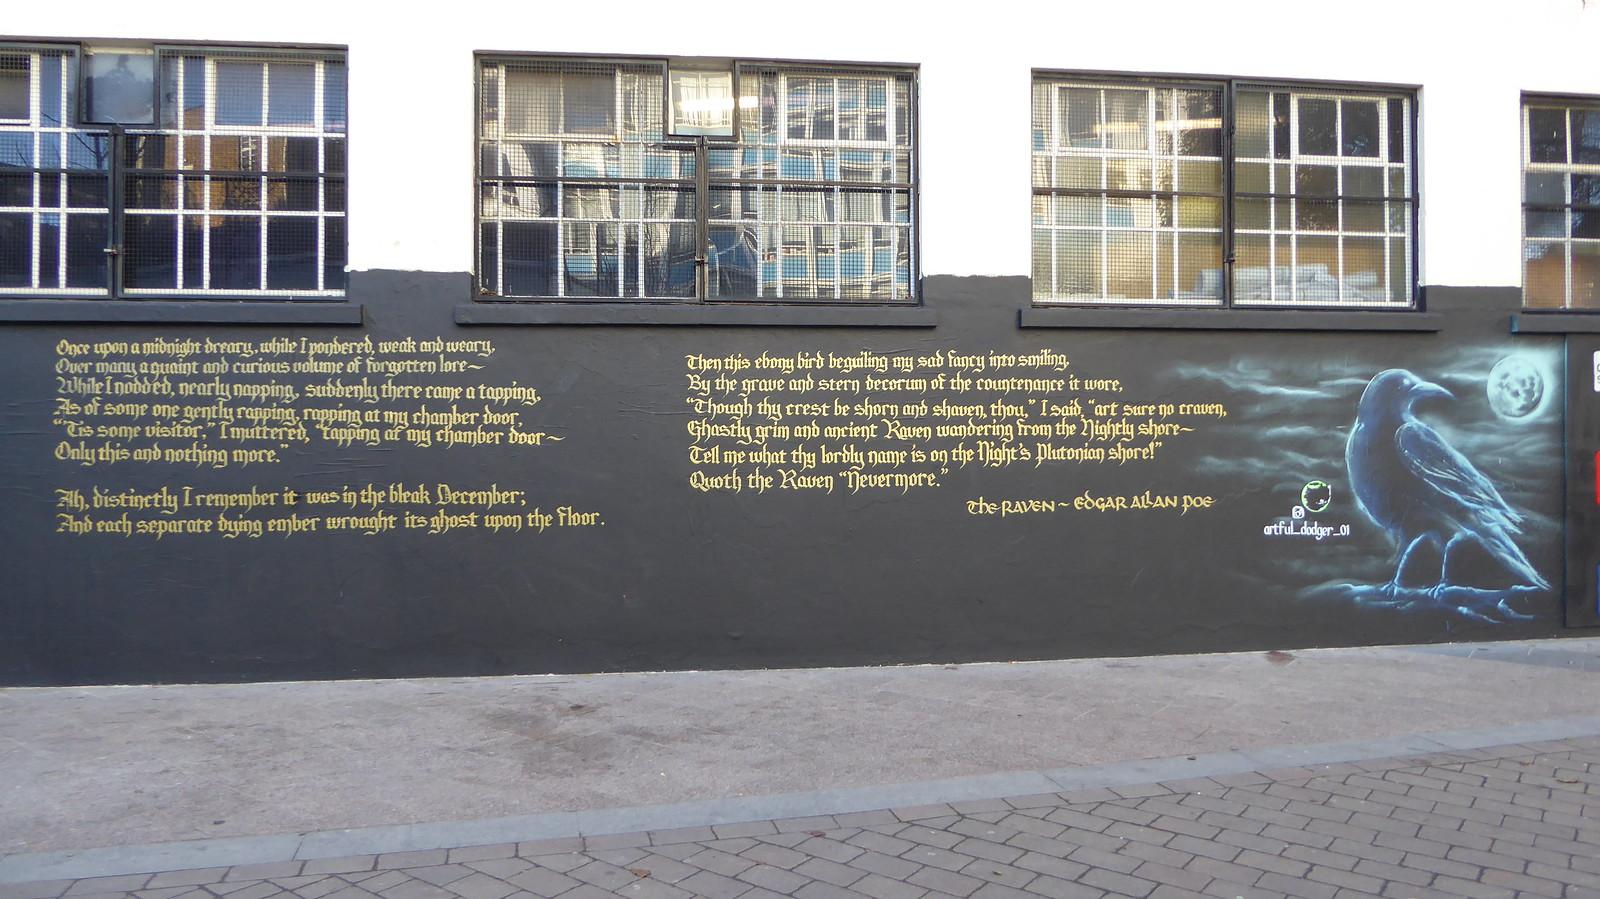 Artful Dodger Graffiti Brixton Wwwpoetryfoundationorgp Flickr